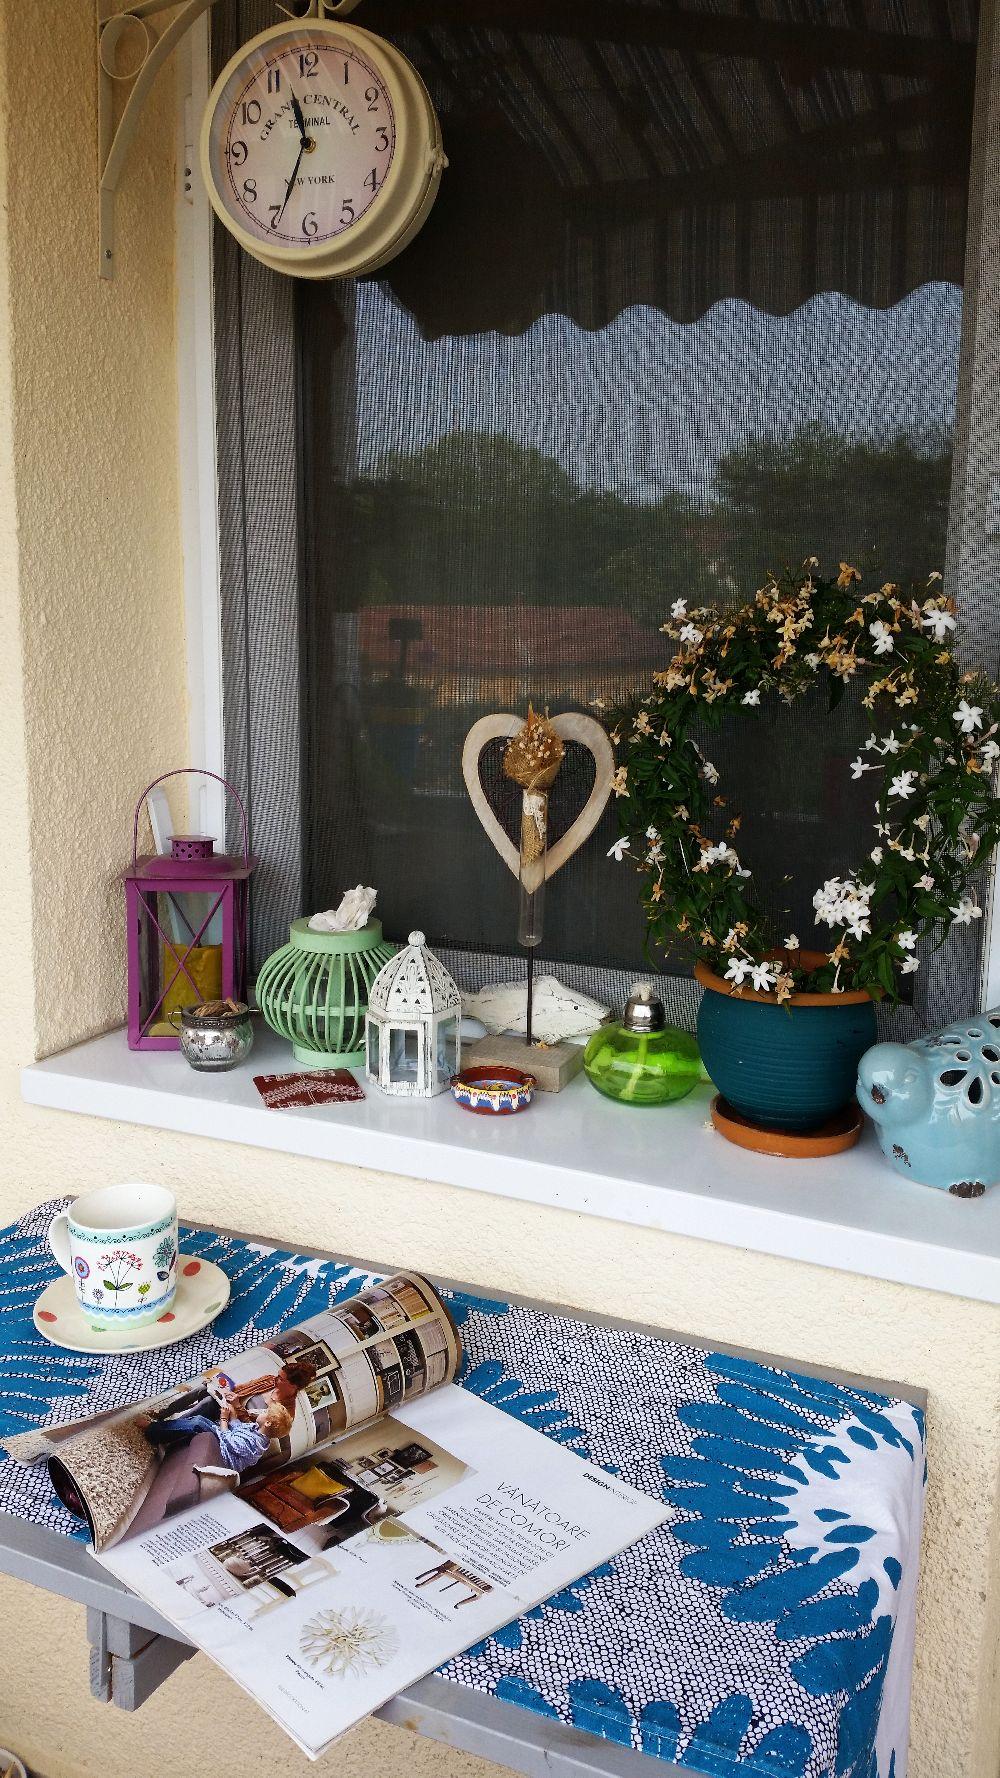 adelaparvu.com despre apartament 3 camere colorat in Sibiu, Foto Adela Parvu (40)